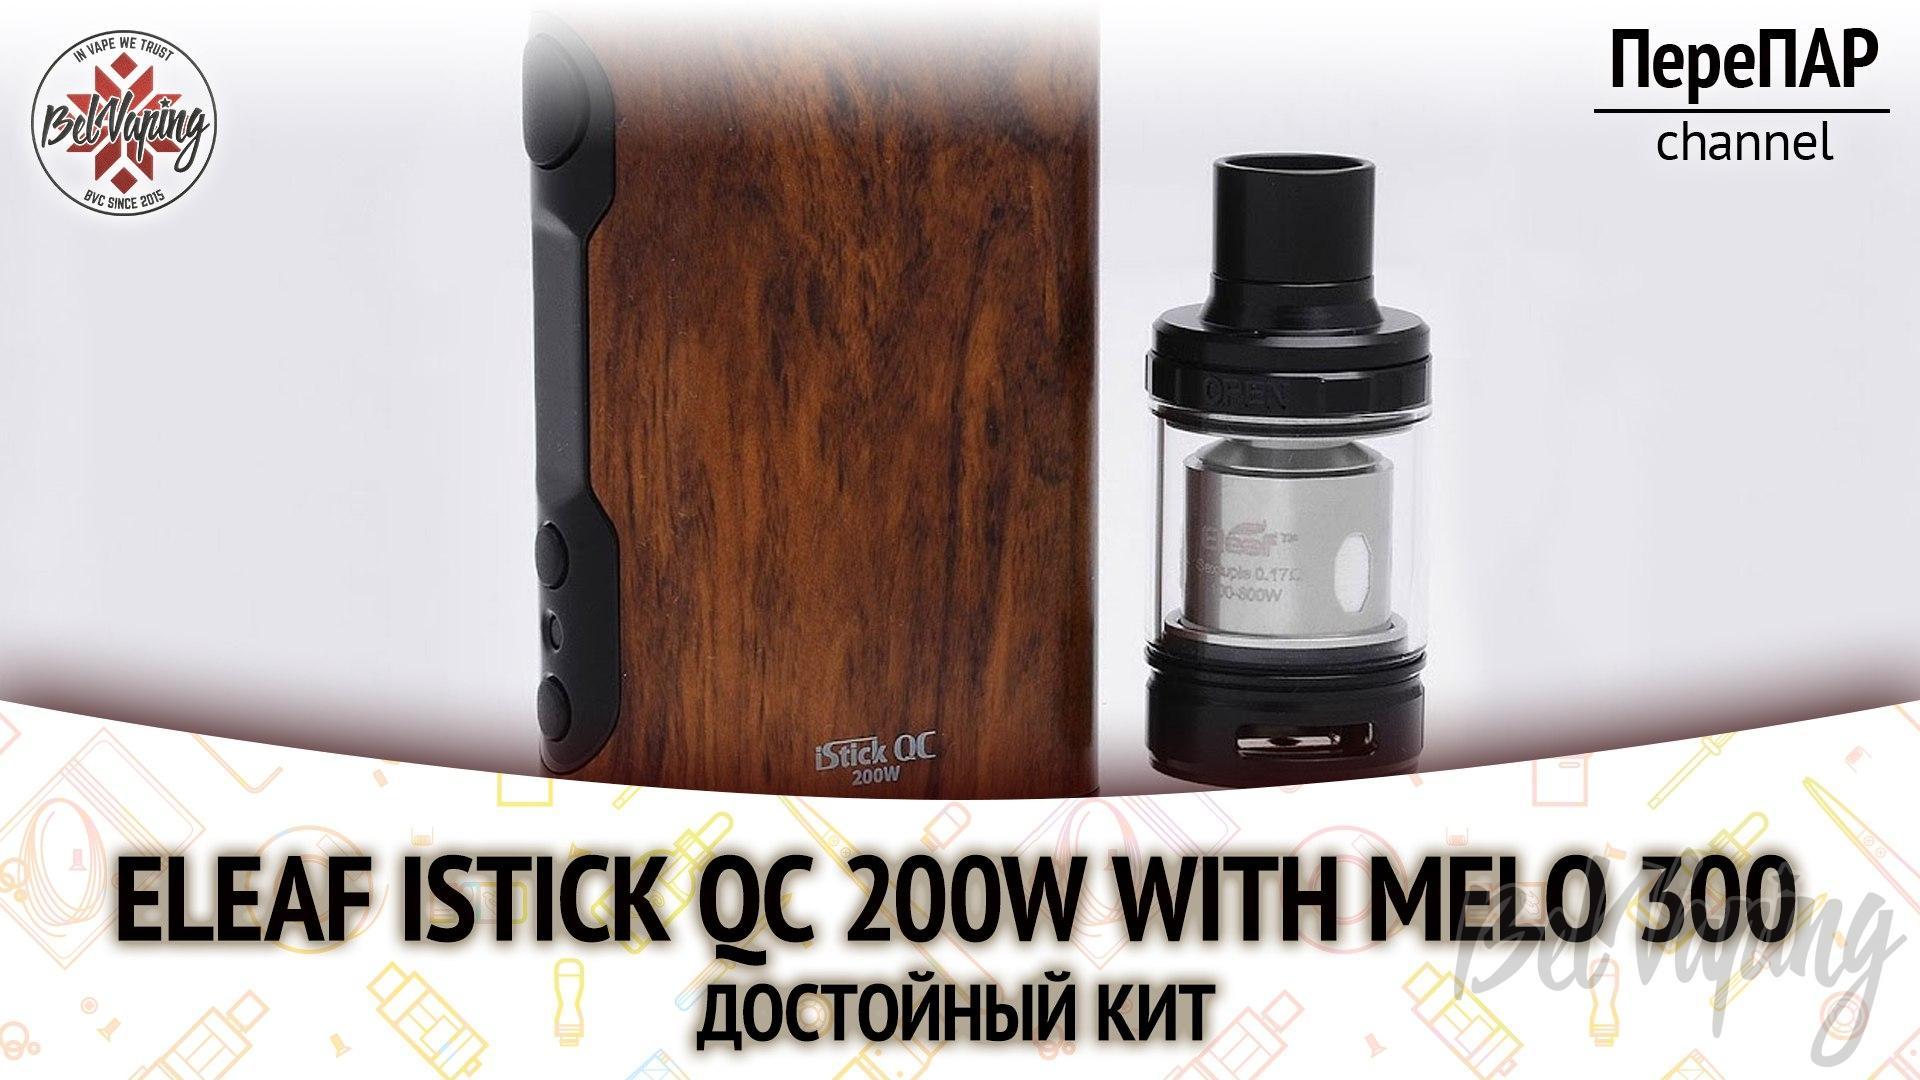 Обзор боксмода Eleaf iStick QC 200W и бакомайзера Eleaf Melo 300